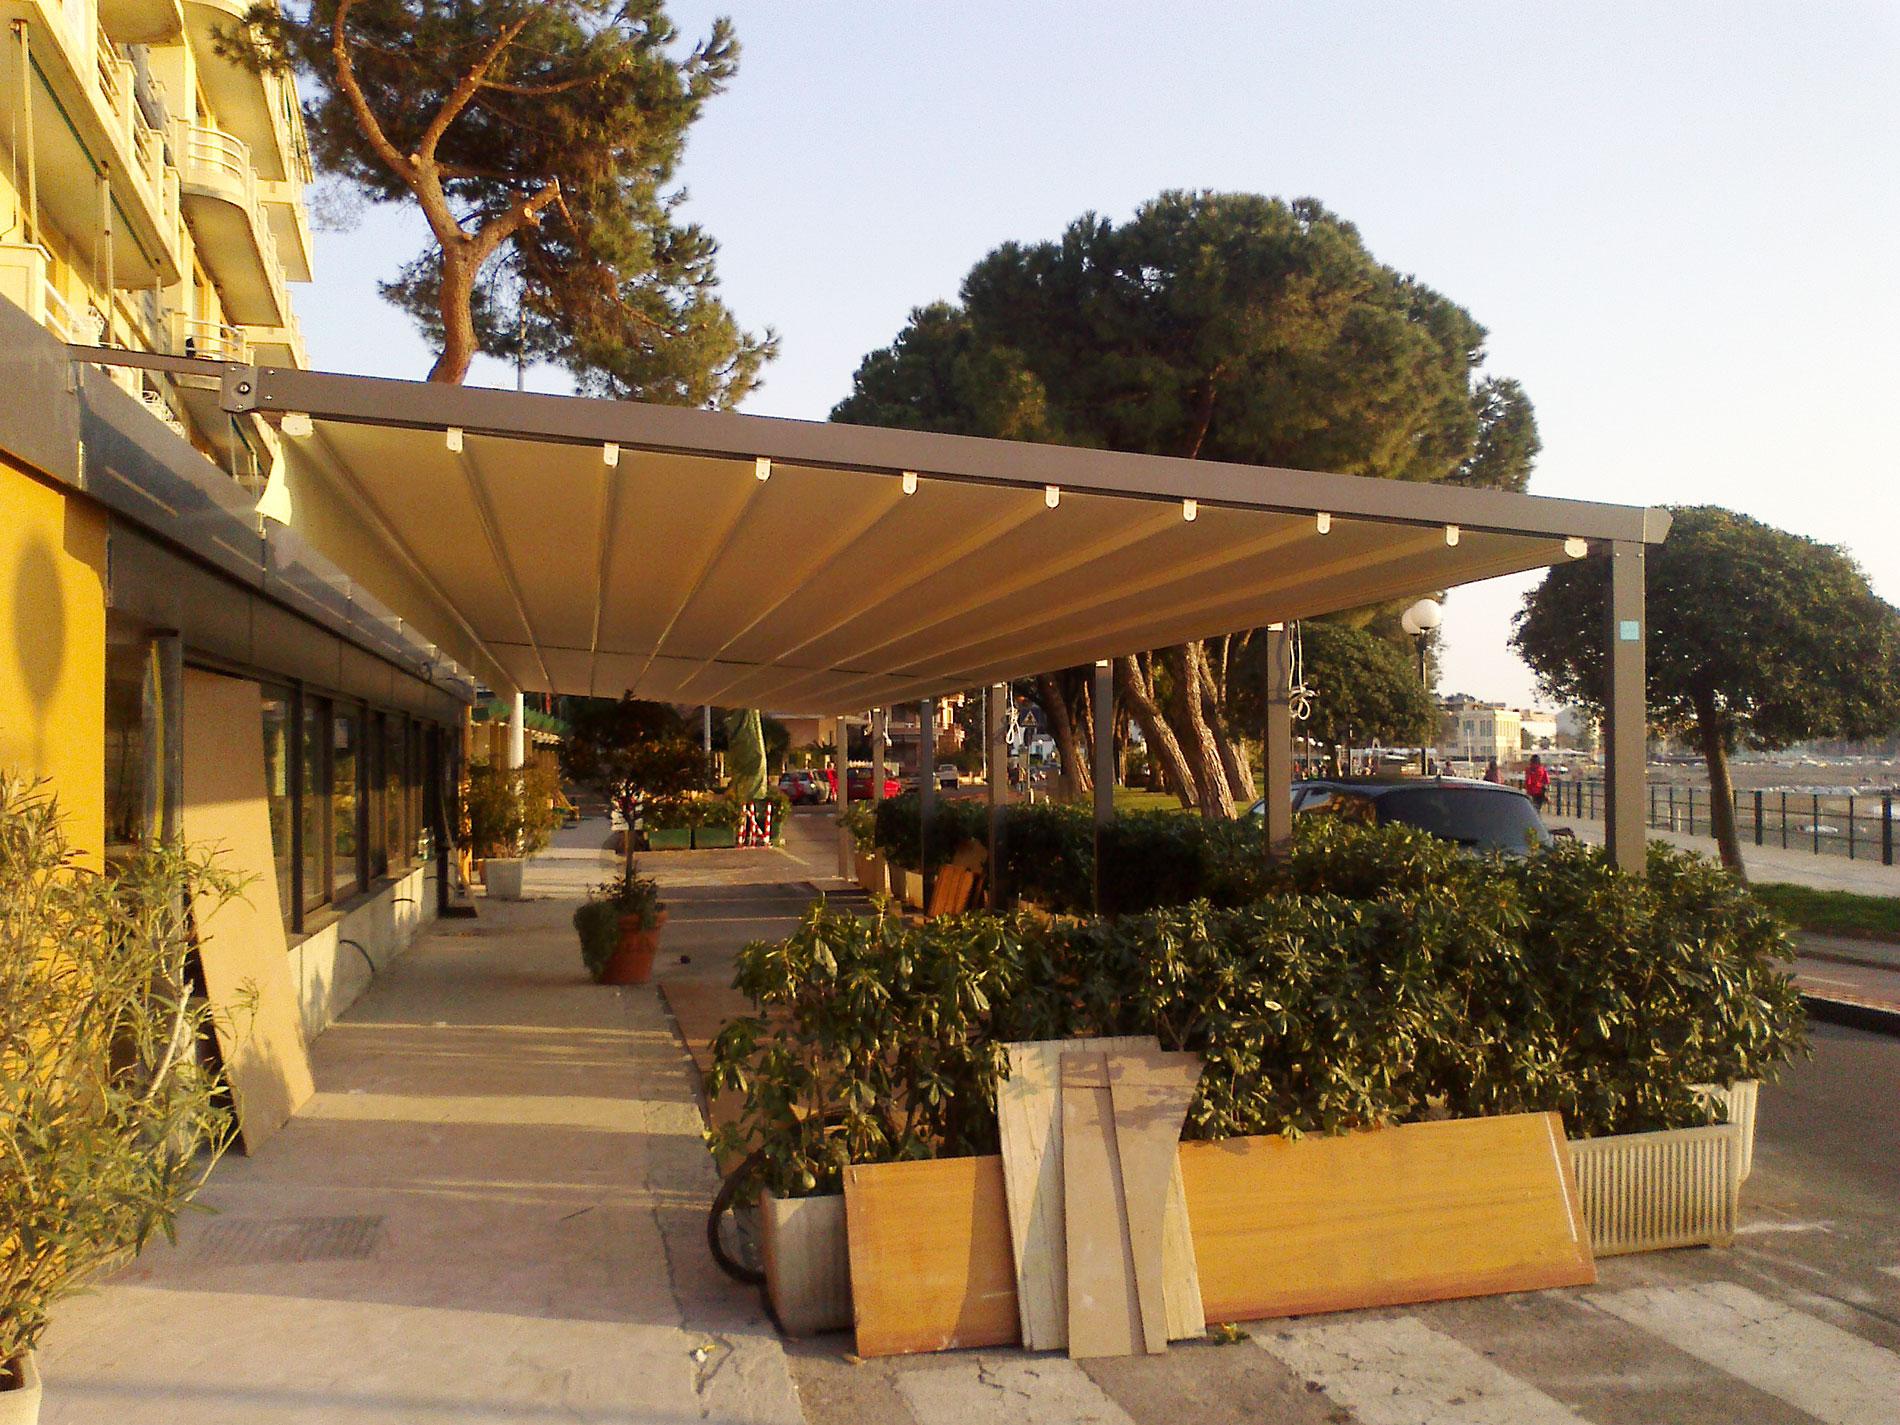 TPS2: Hotel Celeste – Sestri Levante